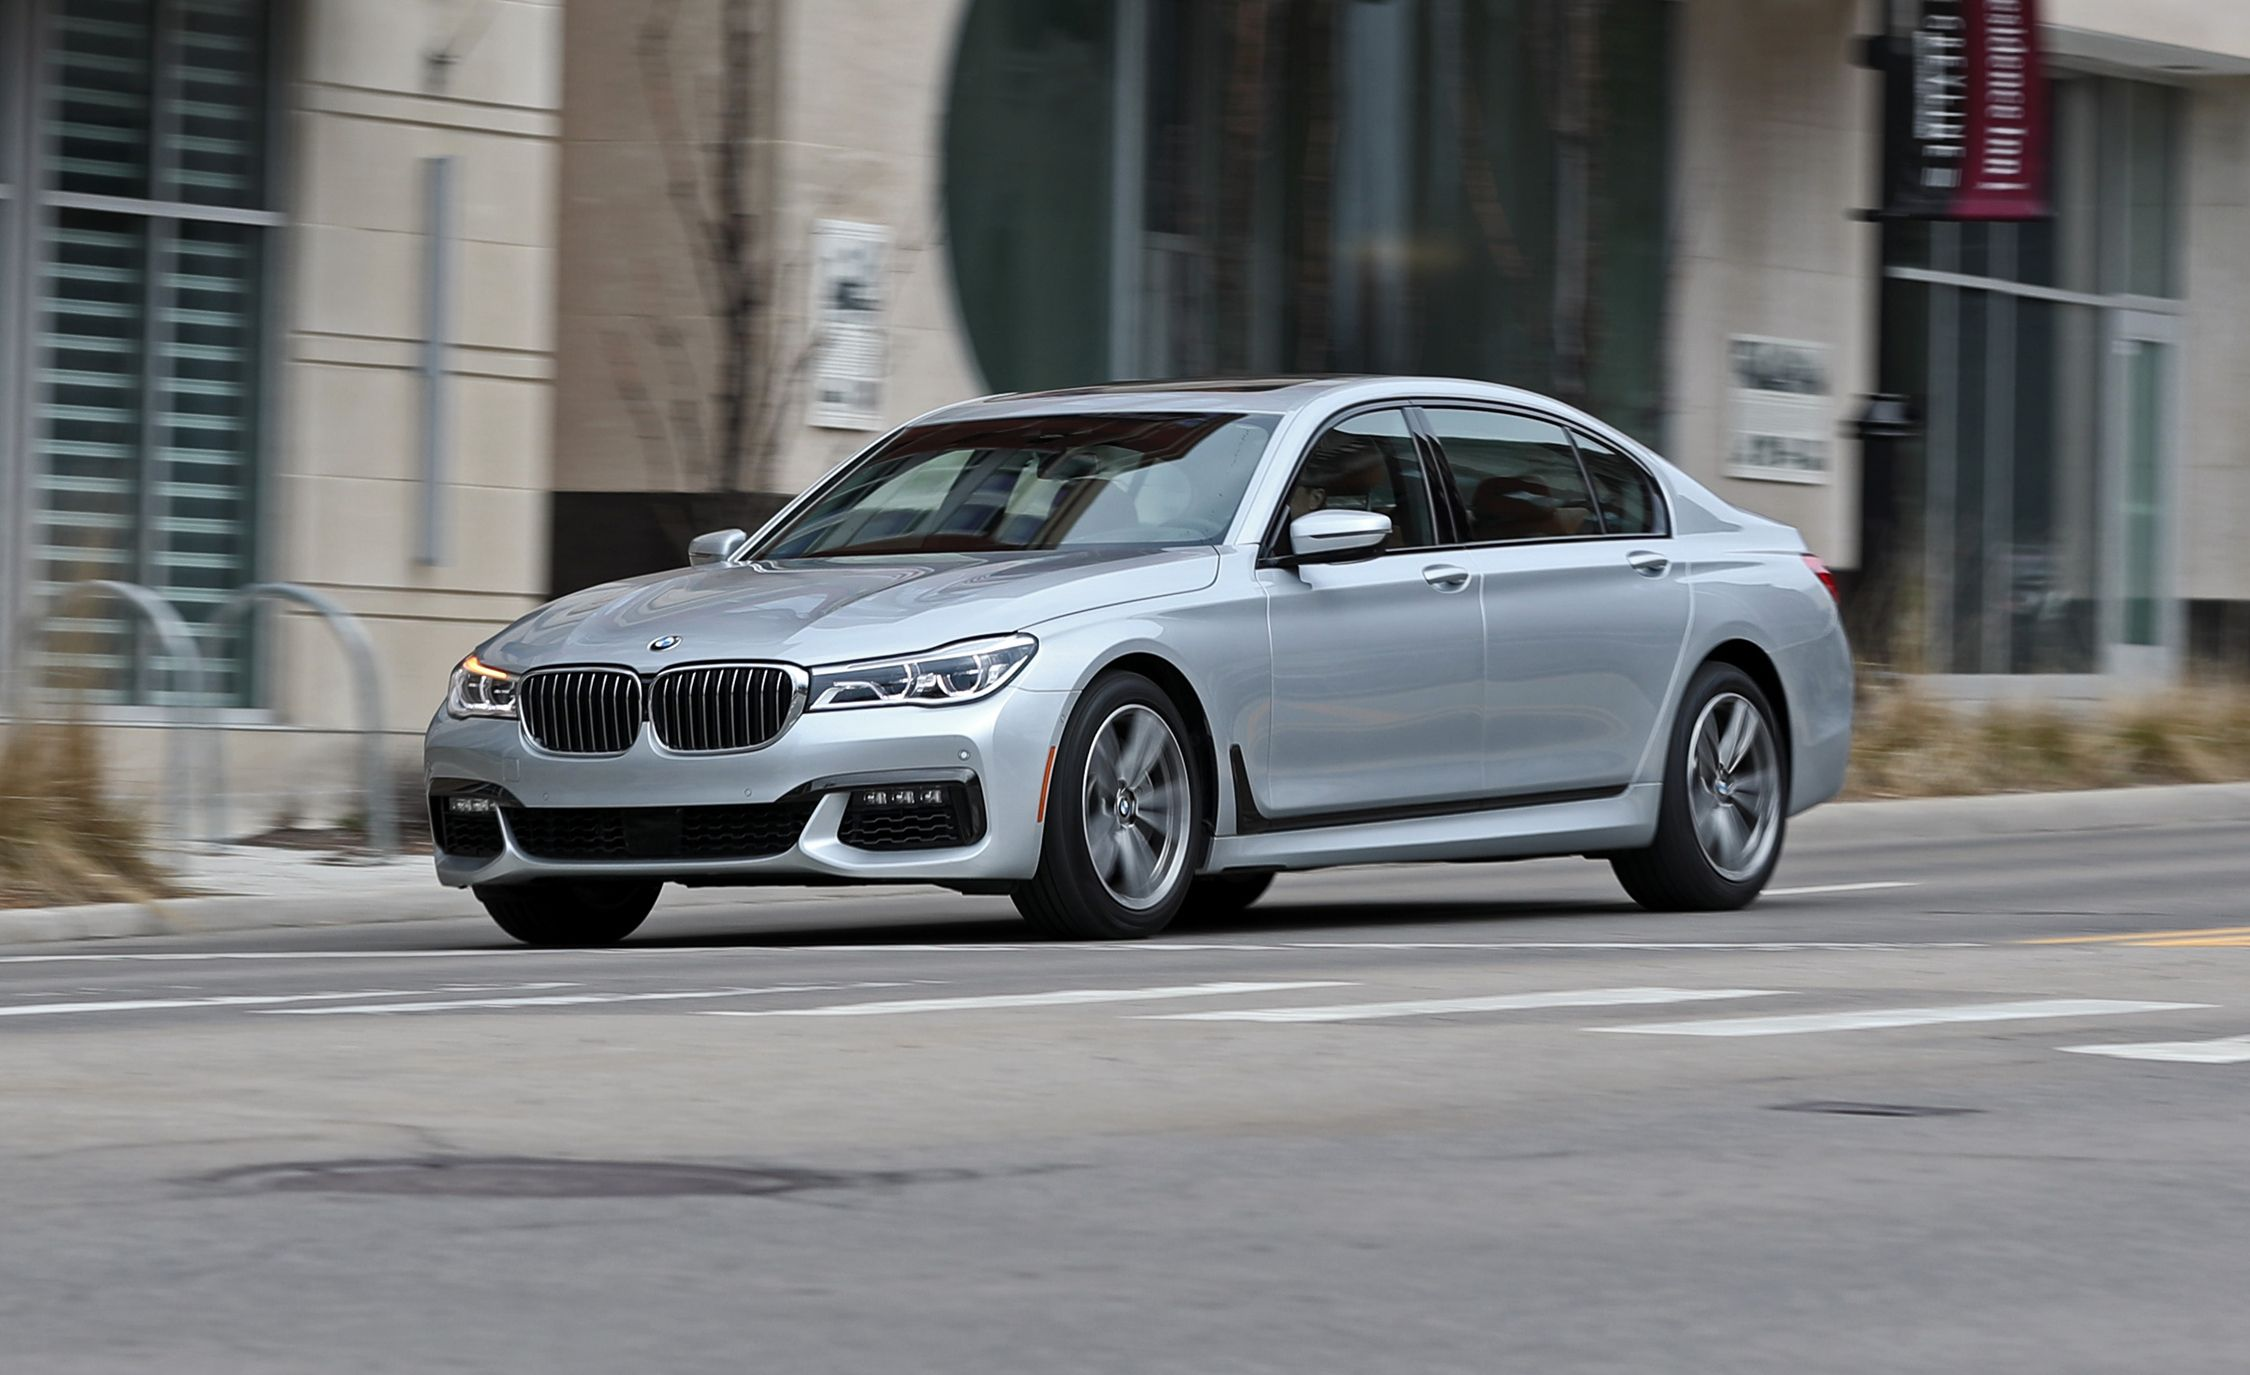 2018 BMW 750i RWD Tested: Premium, Powerful, Far from Playful